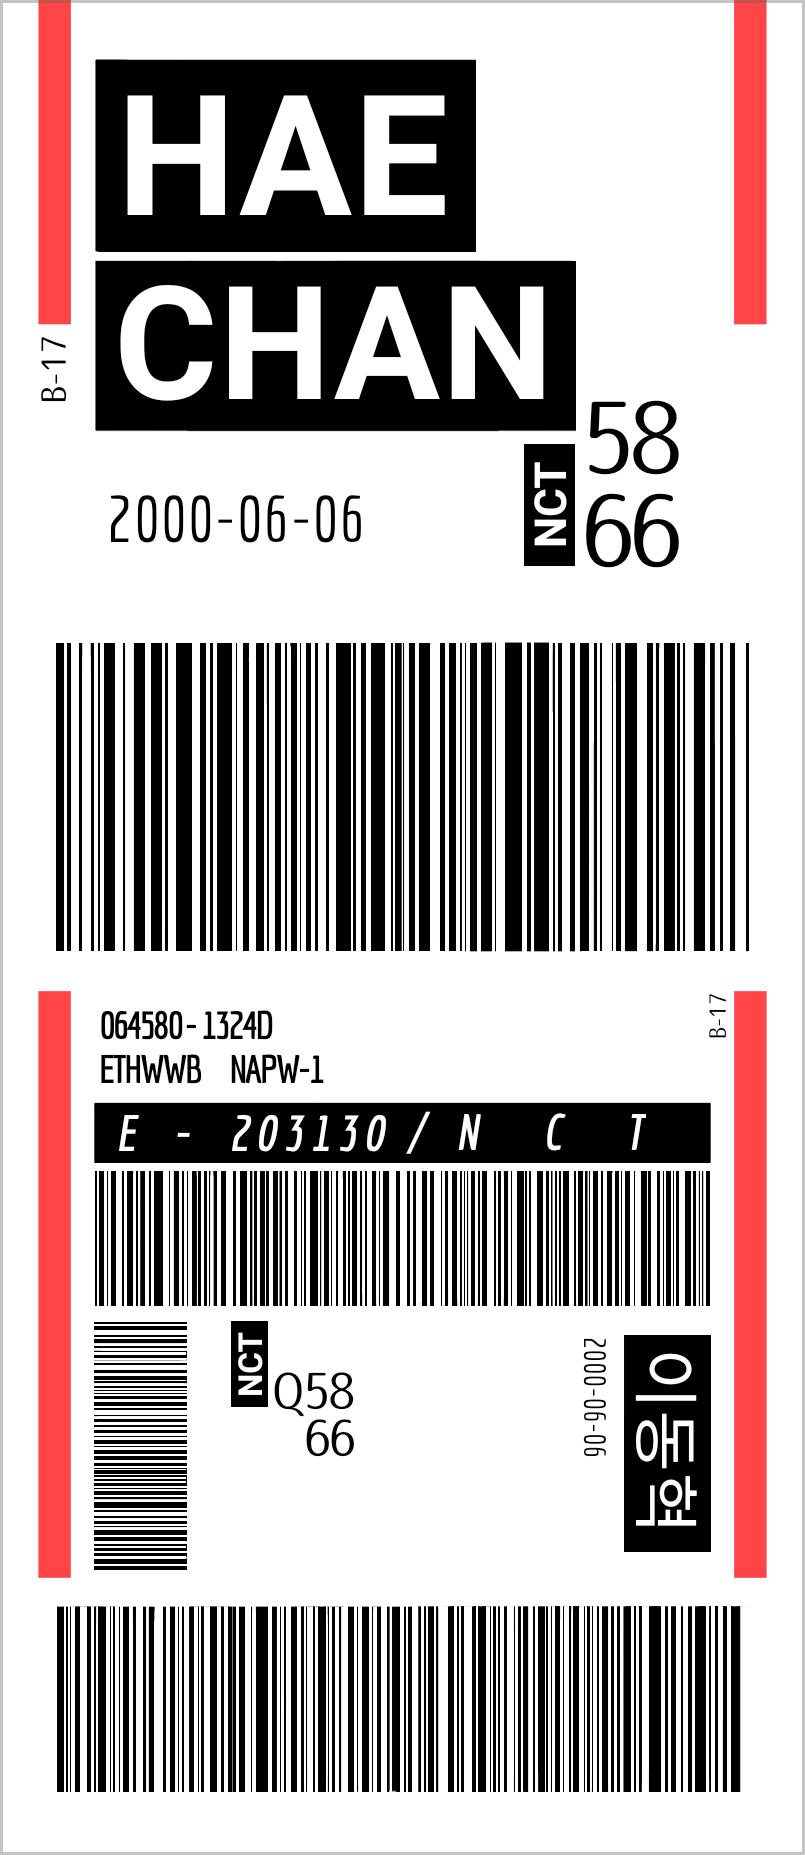 Nct Haechan Ticket Desain Wallpaper Ponsel